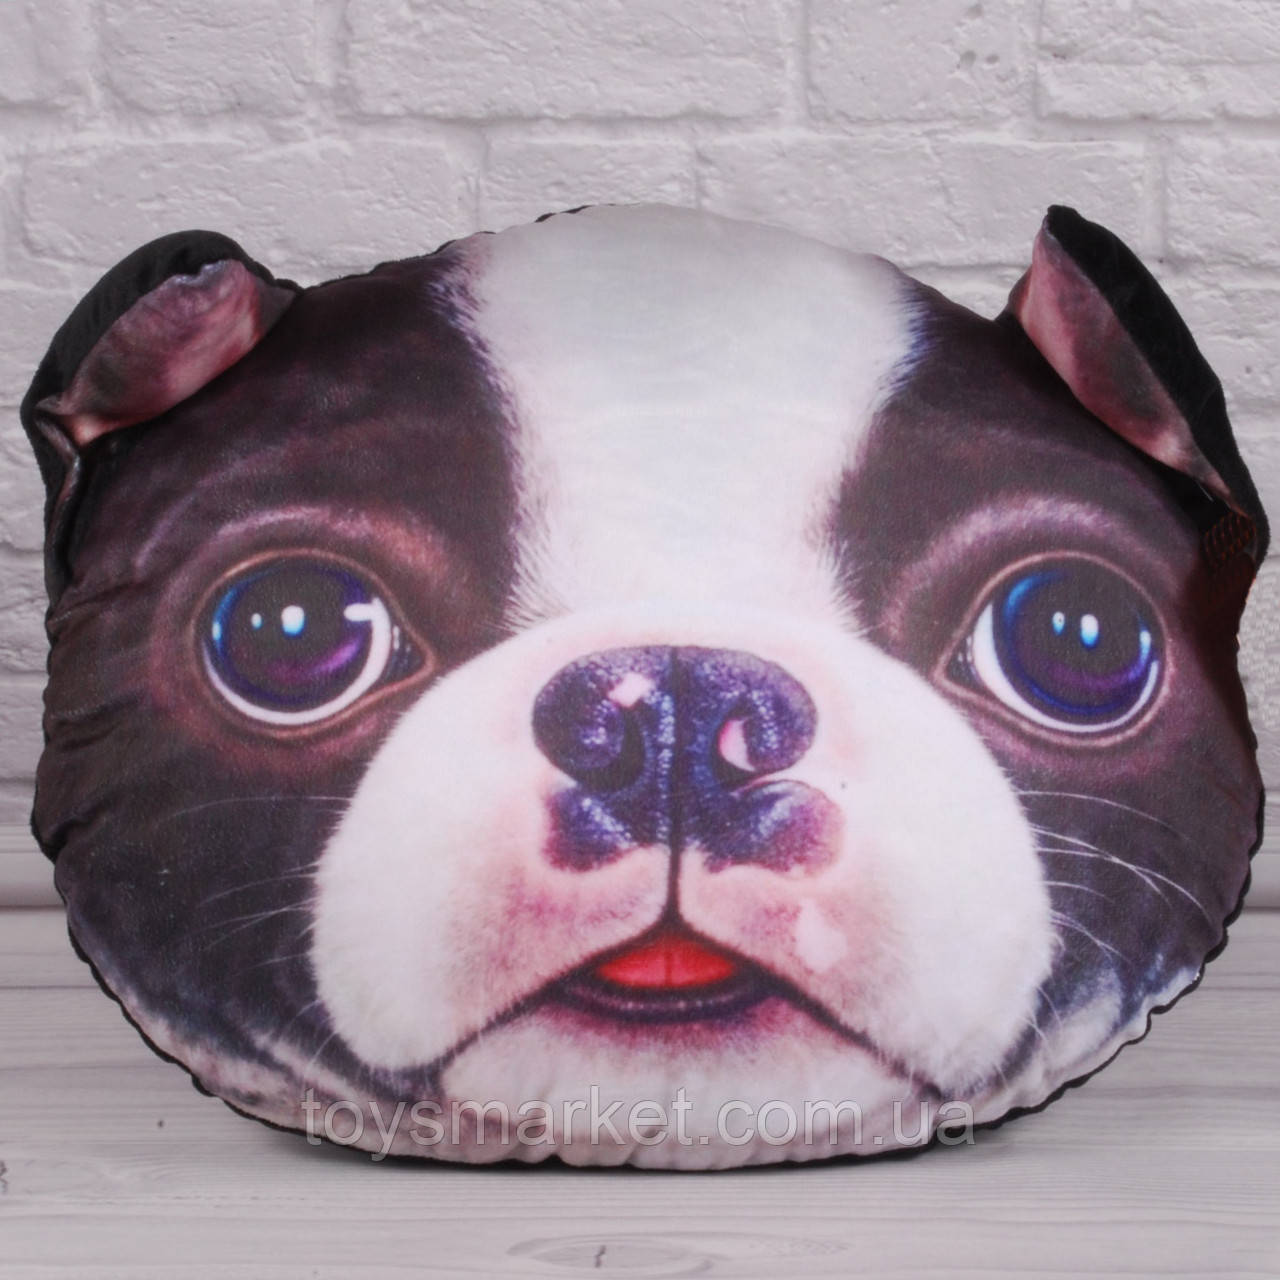 "Мягкая игрушка подушка собака ""Милашка"", плюшевая подушка собачка 35 см."